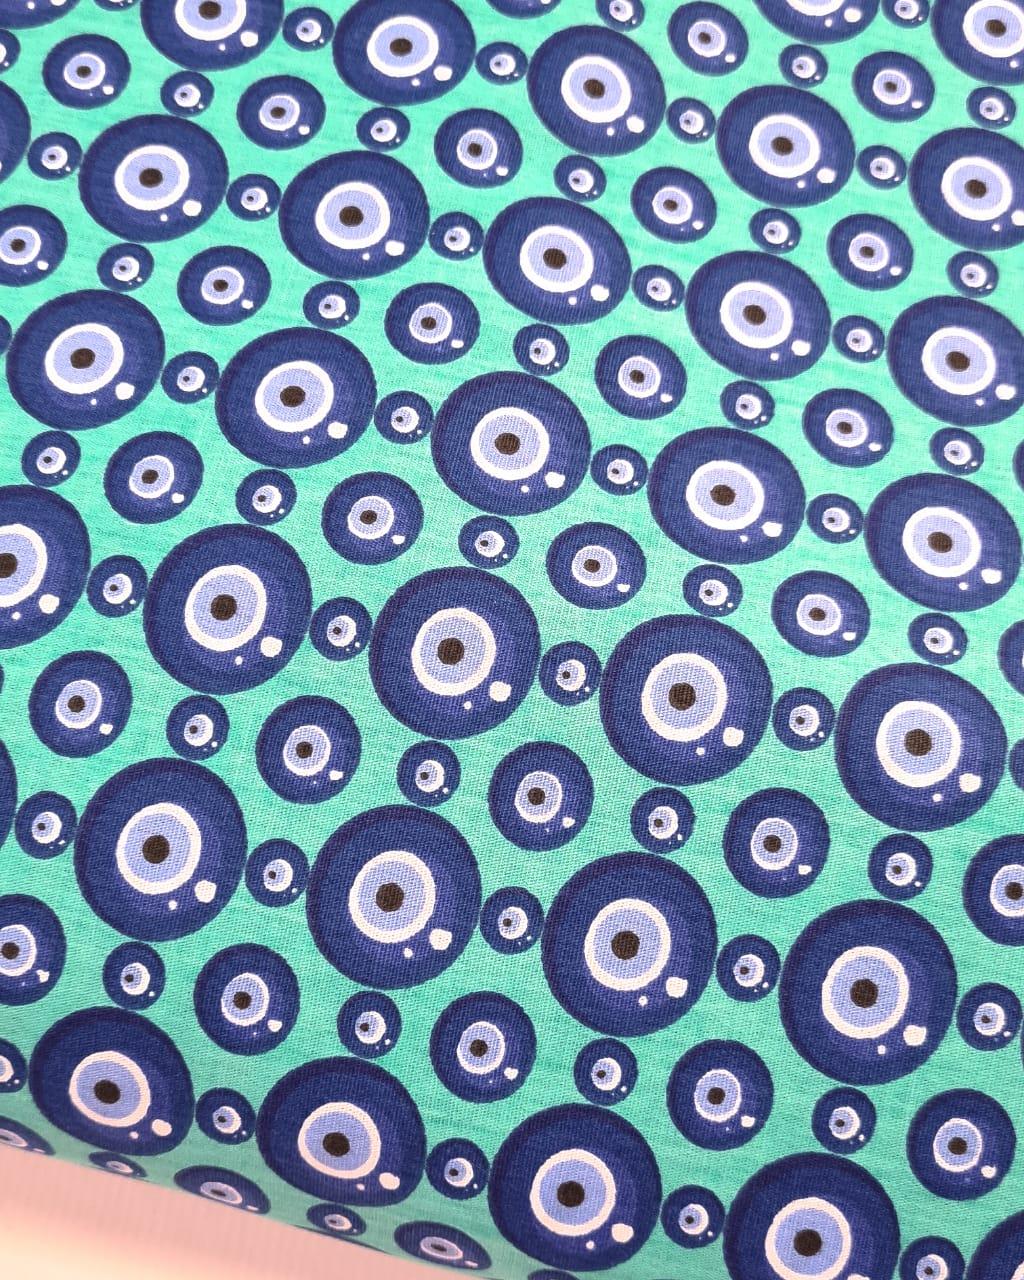 Tecido Olho Grego Fd Verde Tiffany